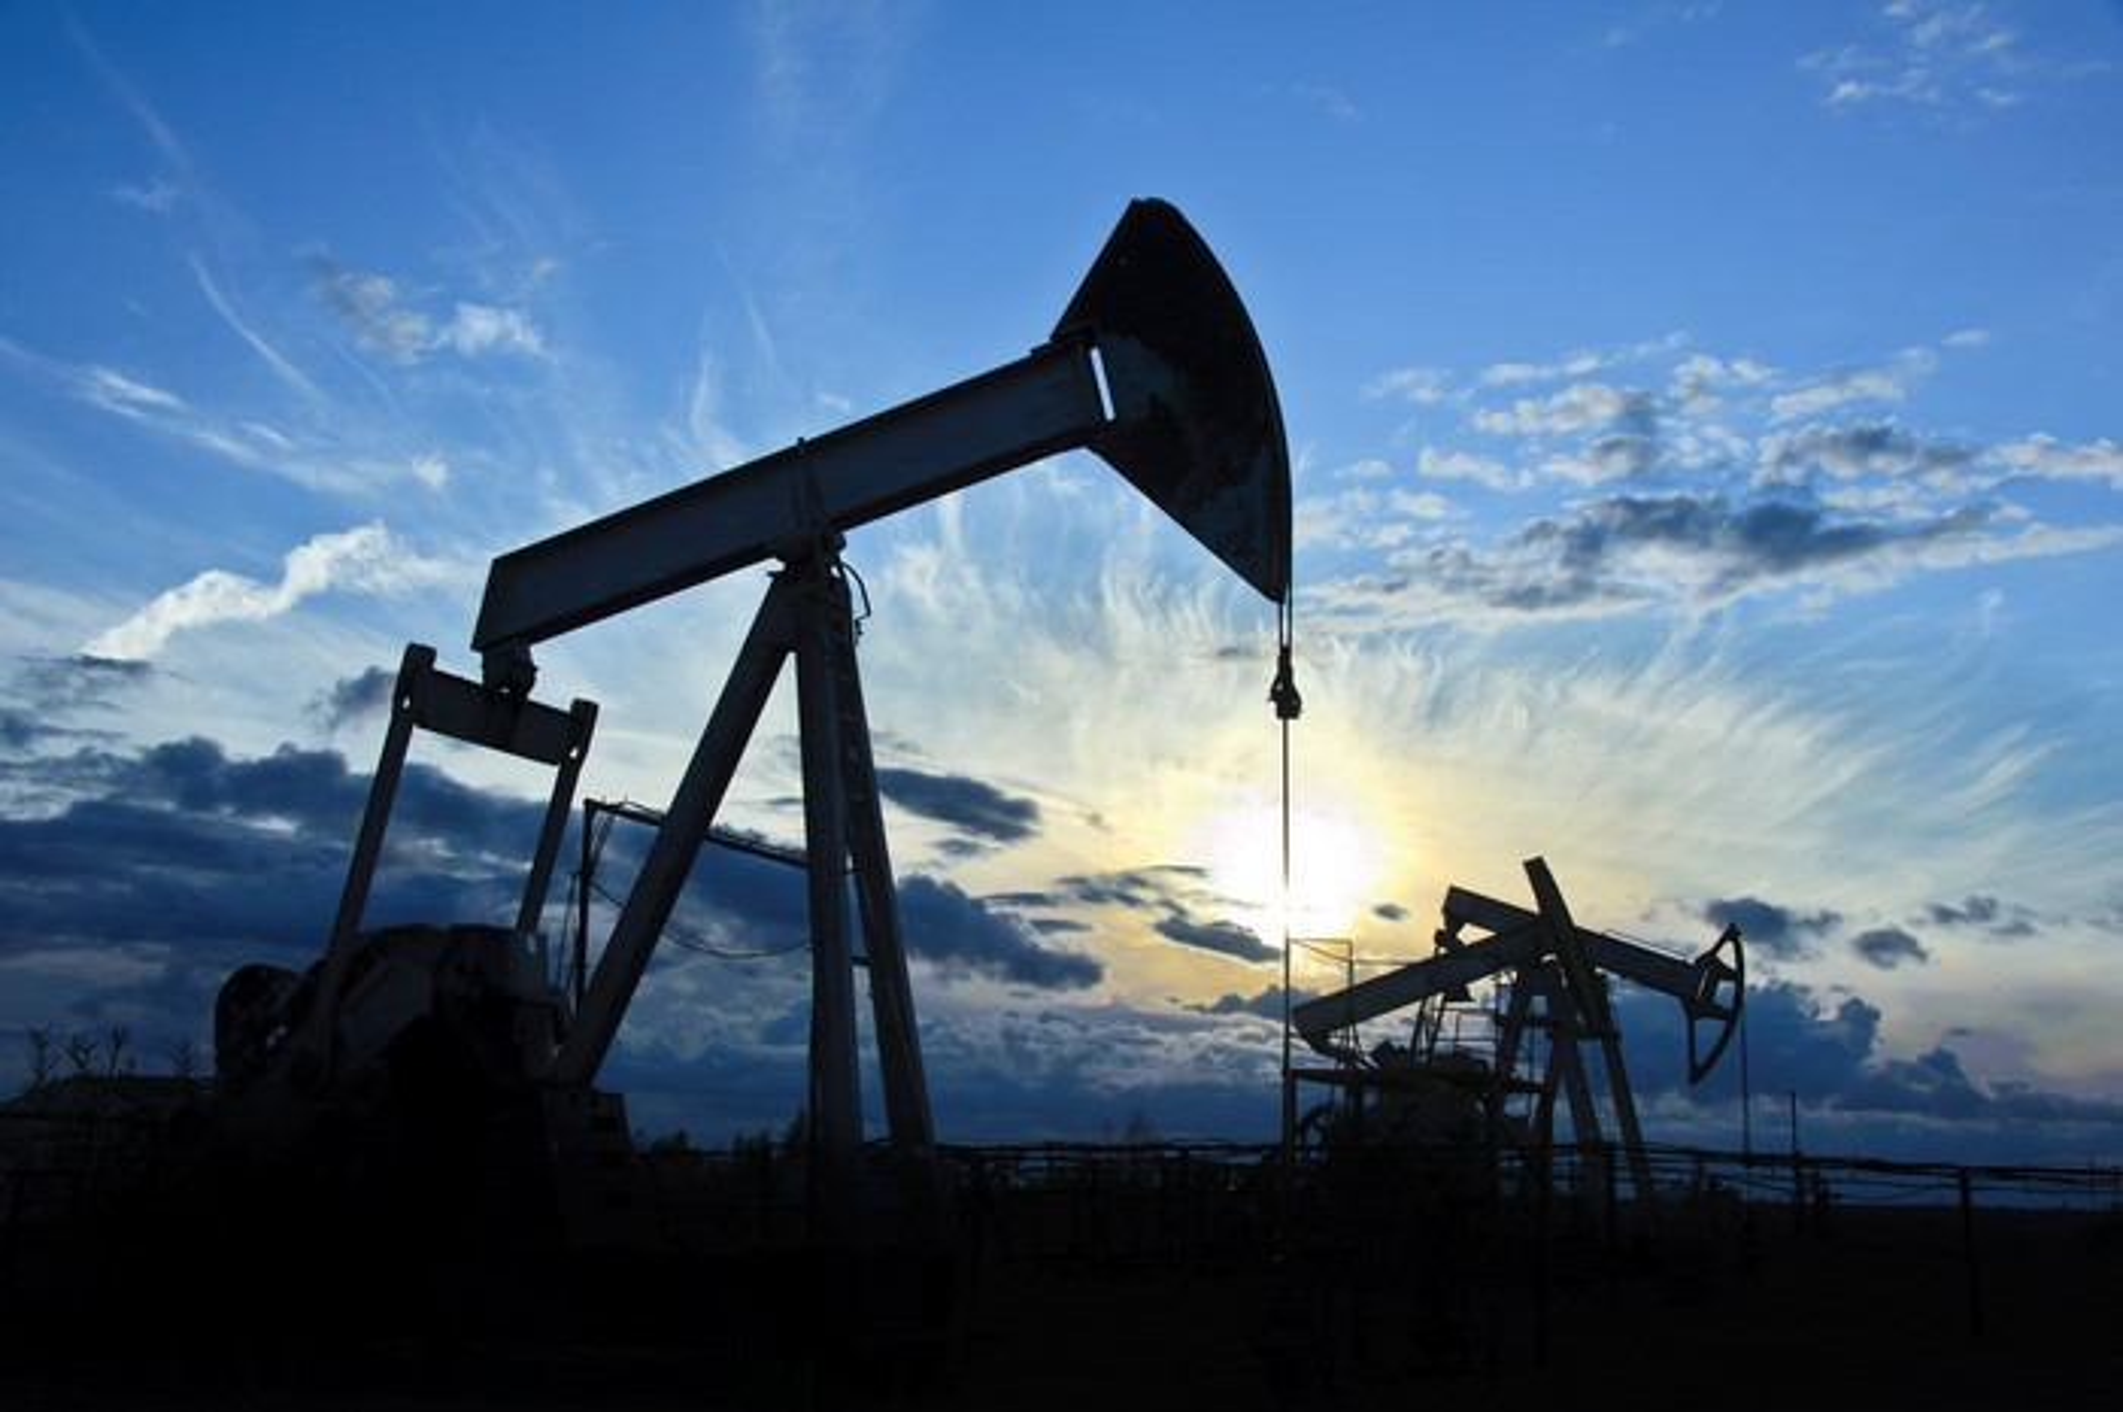 Oil pumps at sunrise.